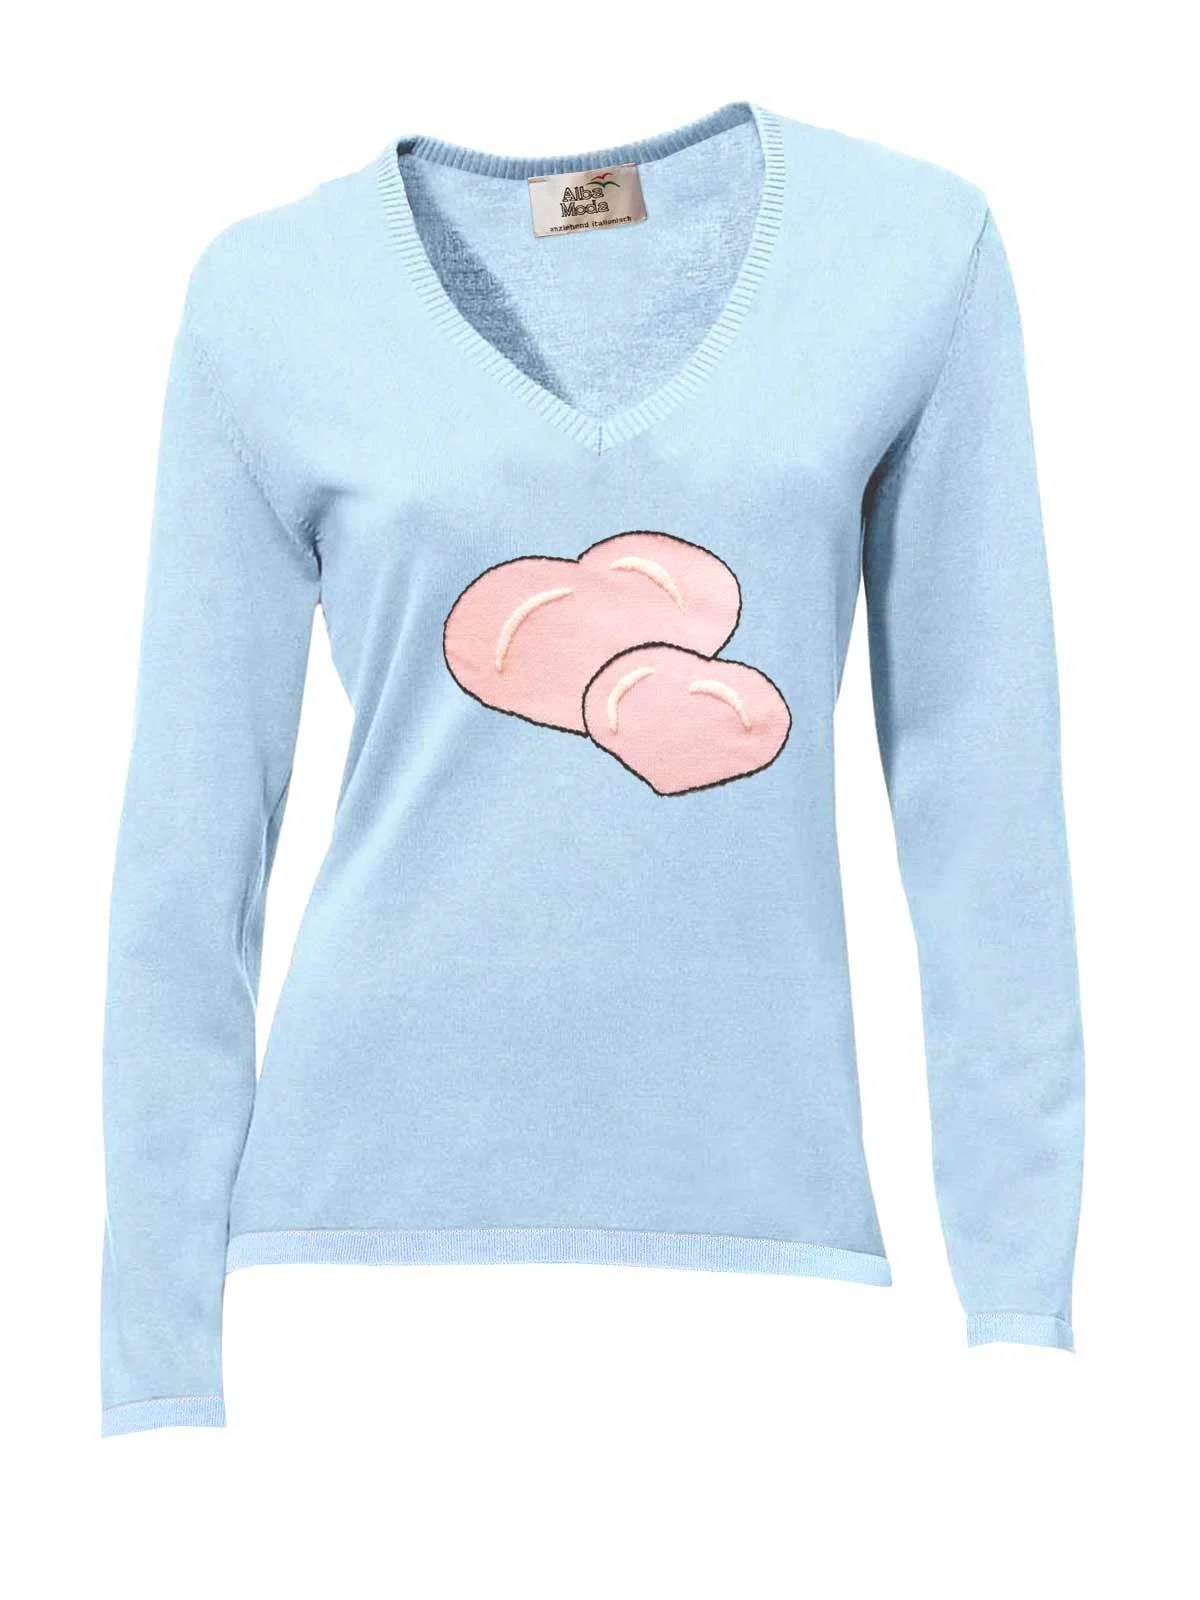 435.193 ALBA MODA Damen Designer-Pullover Blau-Rosé Kurzpullover Herz Feinstreck Herzen